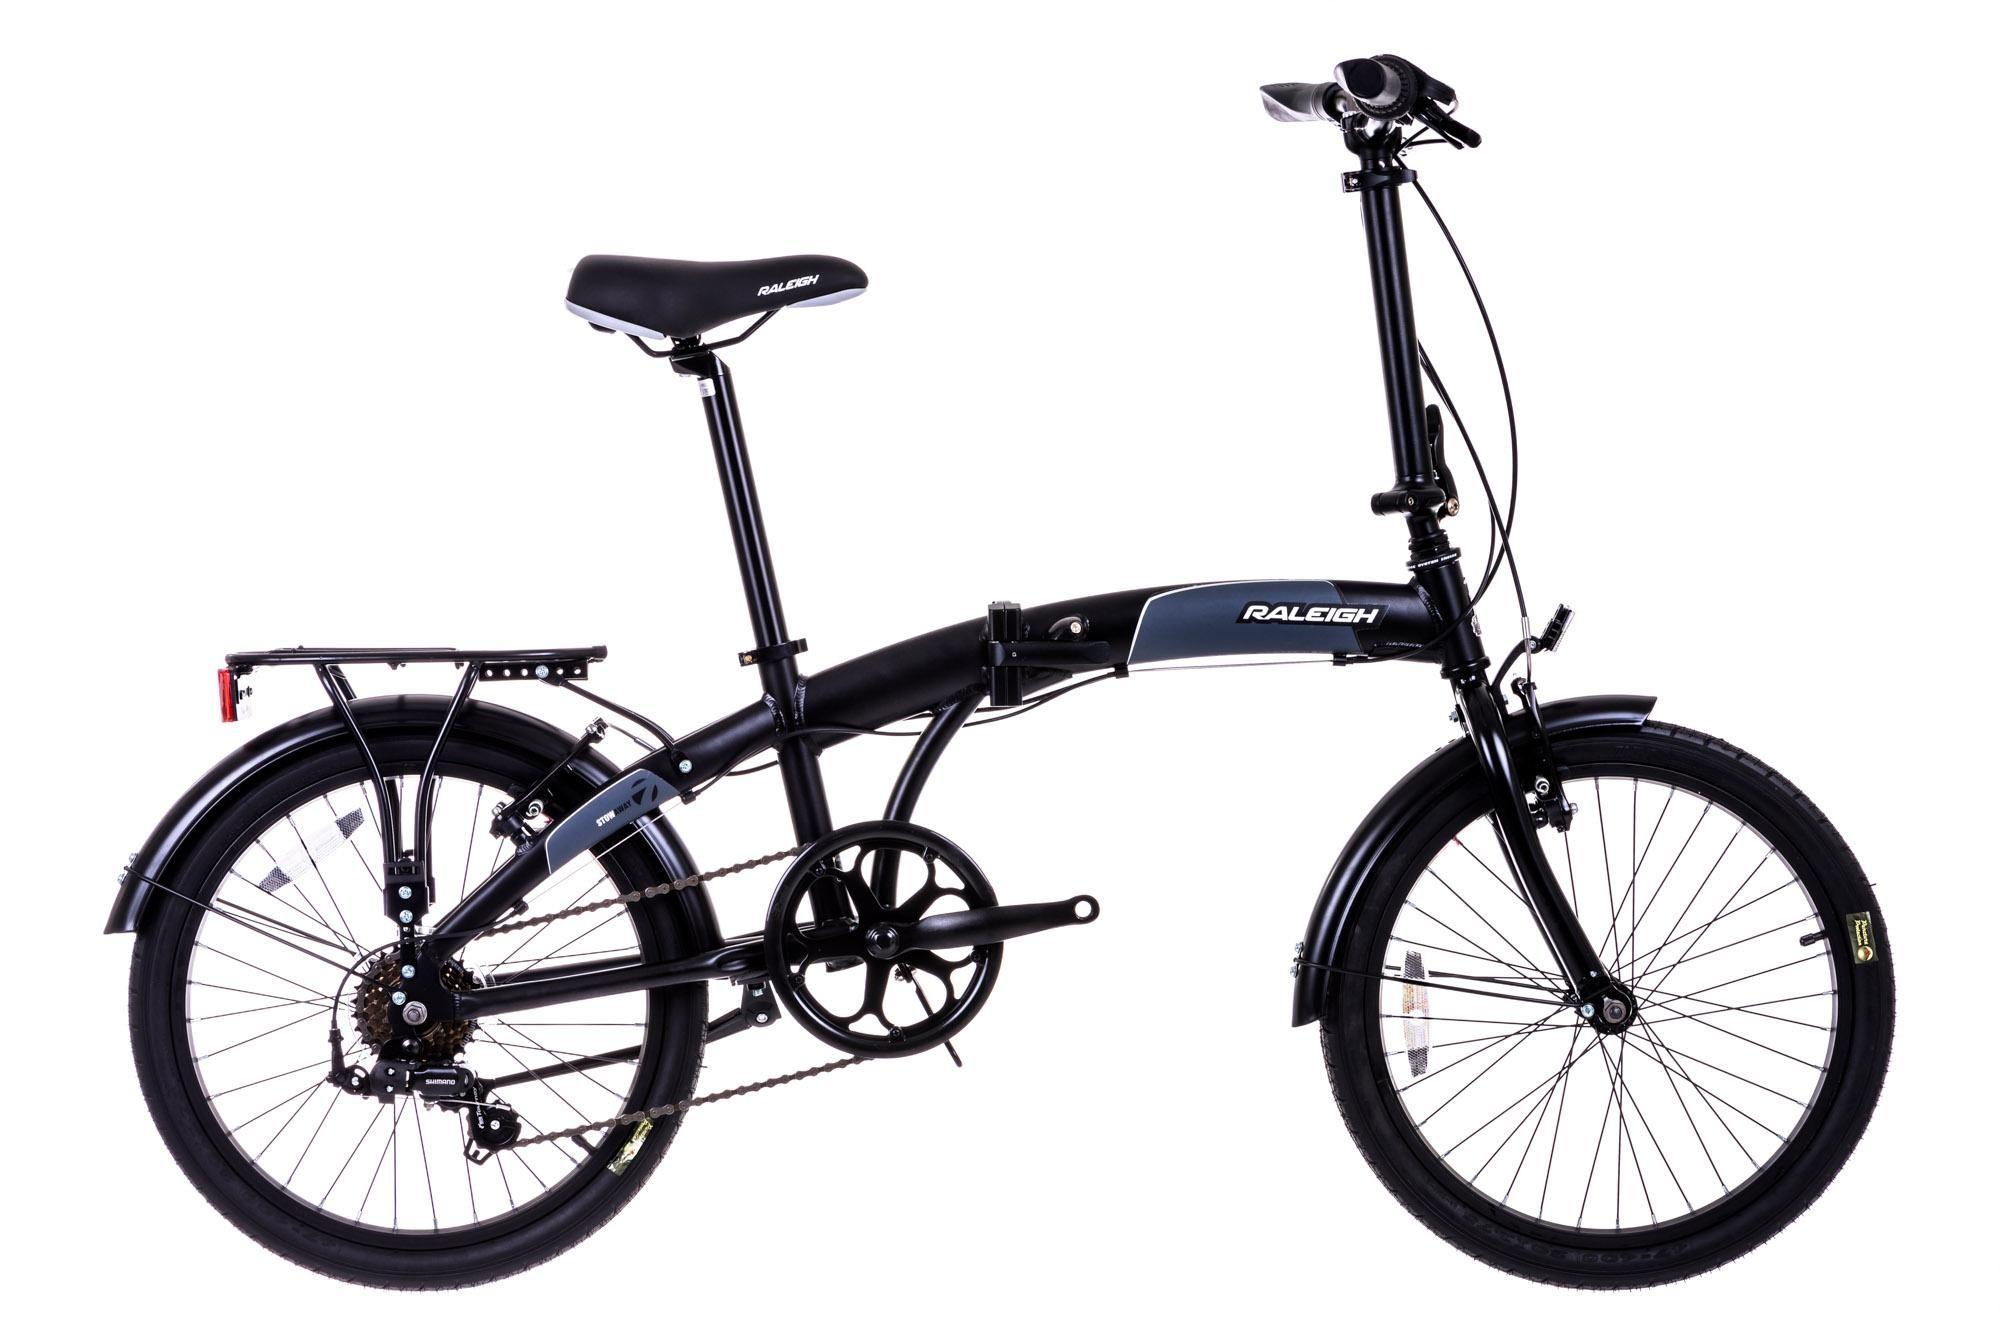 Bici Pieghevole Matex.Stowaway 7 Bike Folding Electric Bike Pocket Bike